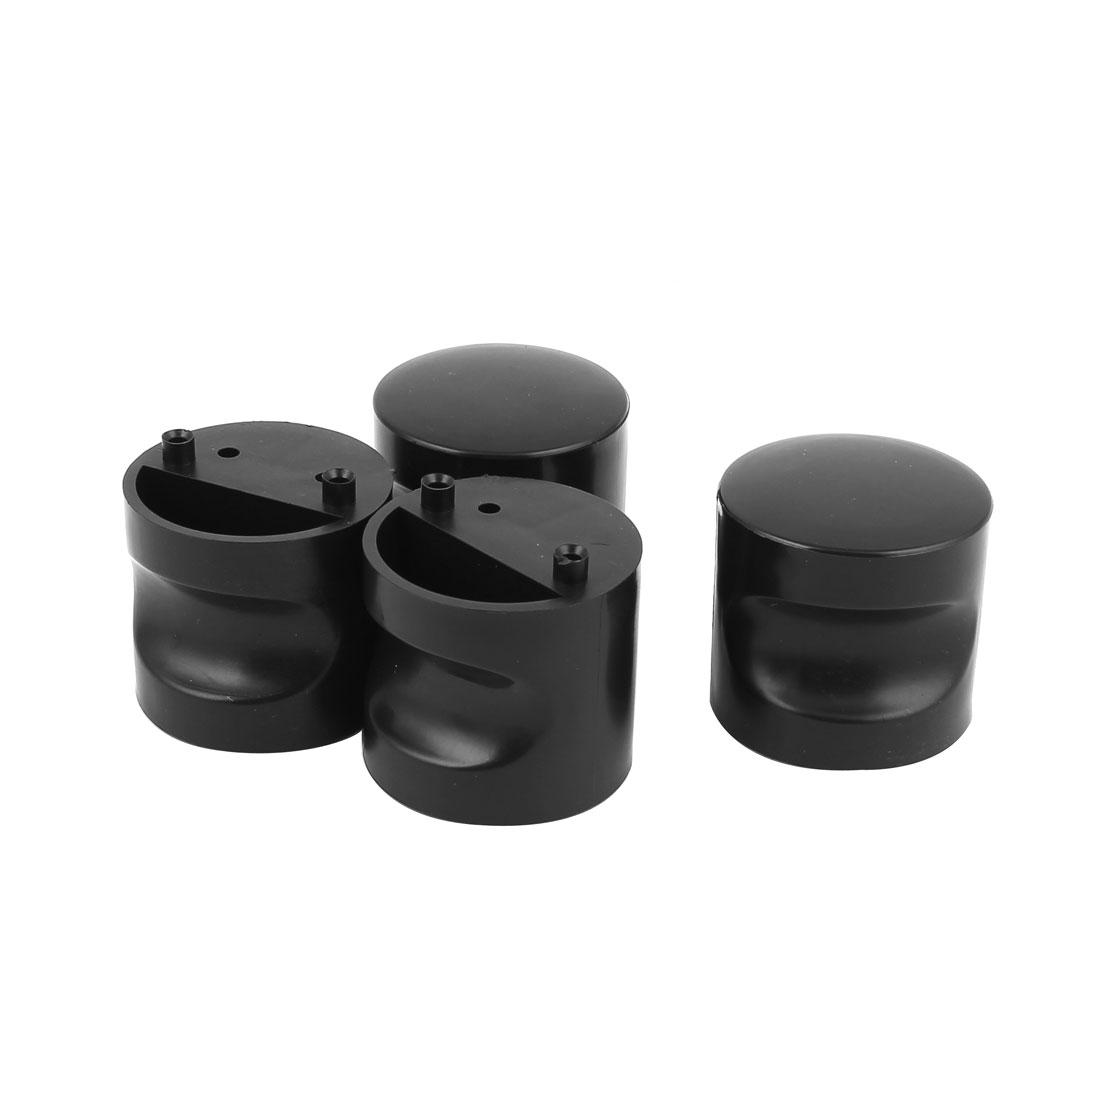 Toliet Door Plastic Cylinder Knob Pull Handle Black 4pcs